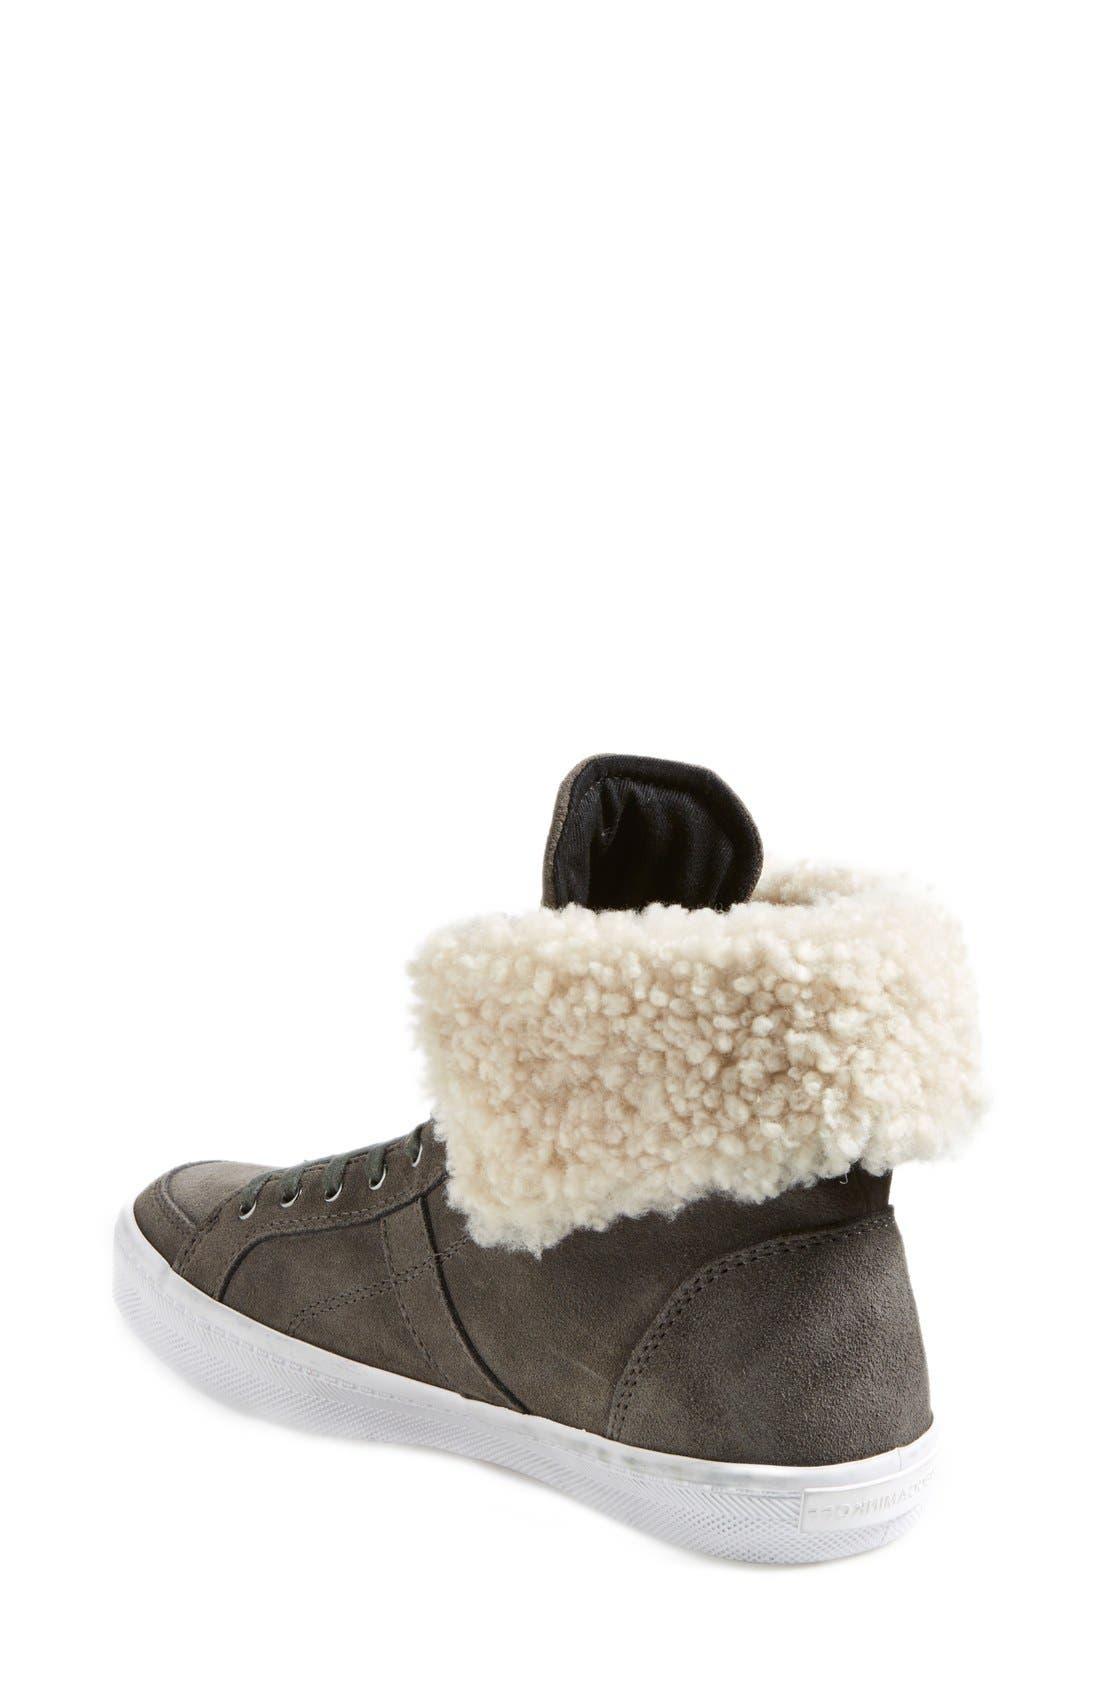 REBECCA MINKOFF,                             'Sasha' Suede High Top Sneaker,                             Alternate thumbnail 3, color,                             020